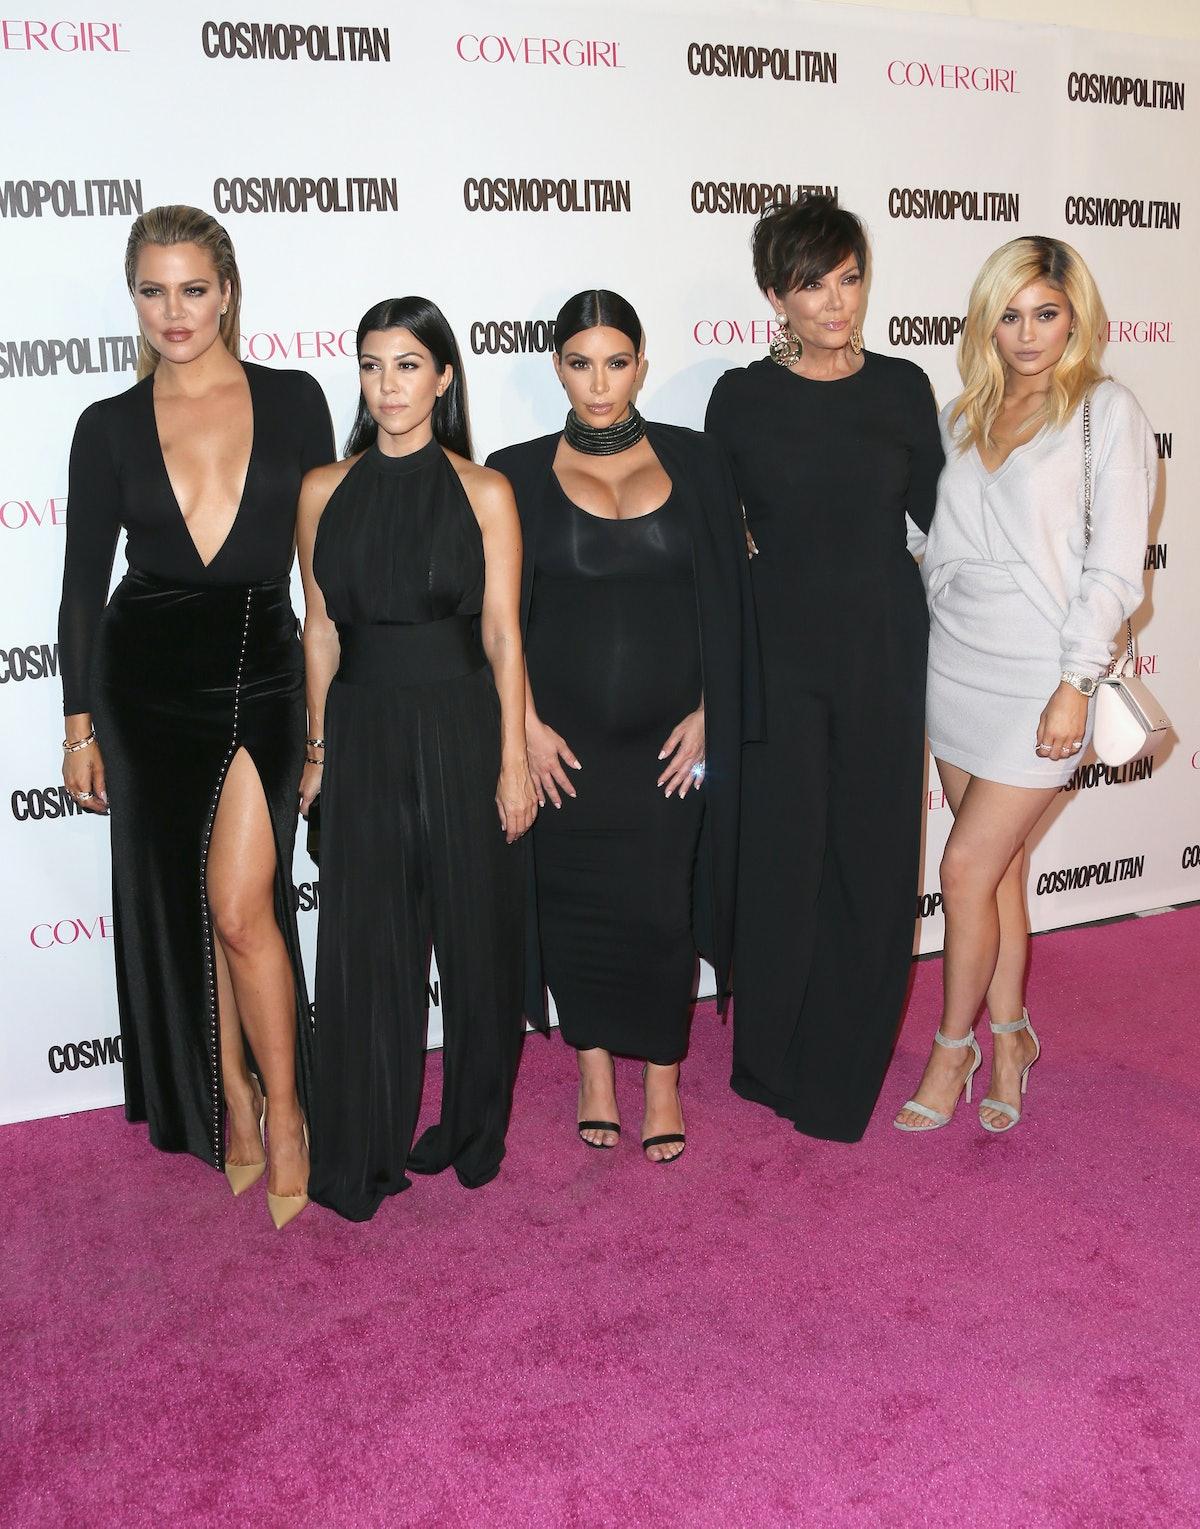 The Kardashians' Instagrams For Kim's 39th Birthday Are Cute Throwback Photos